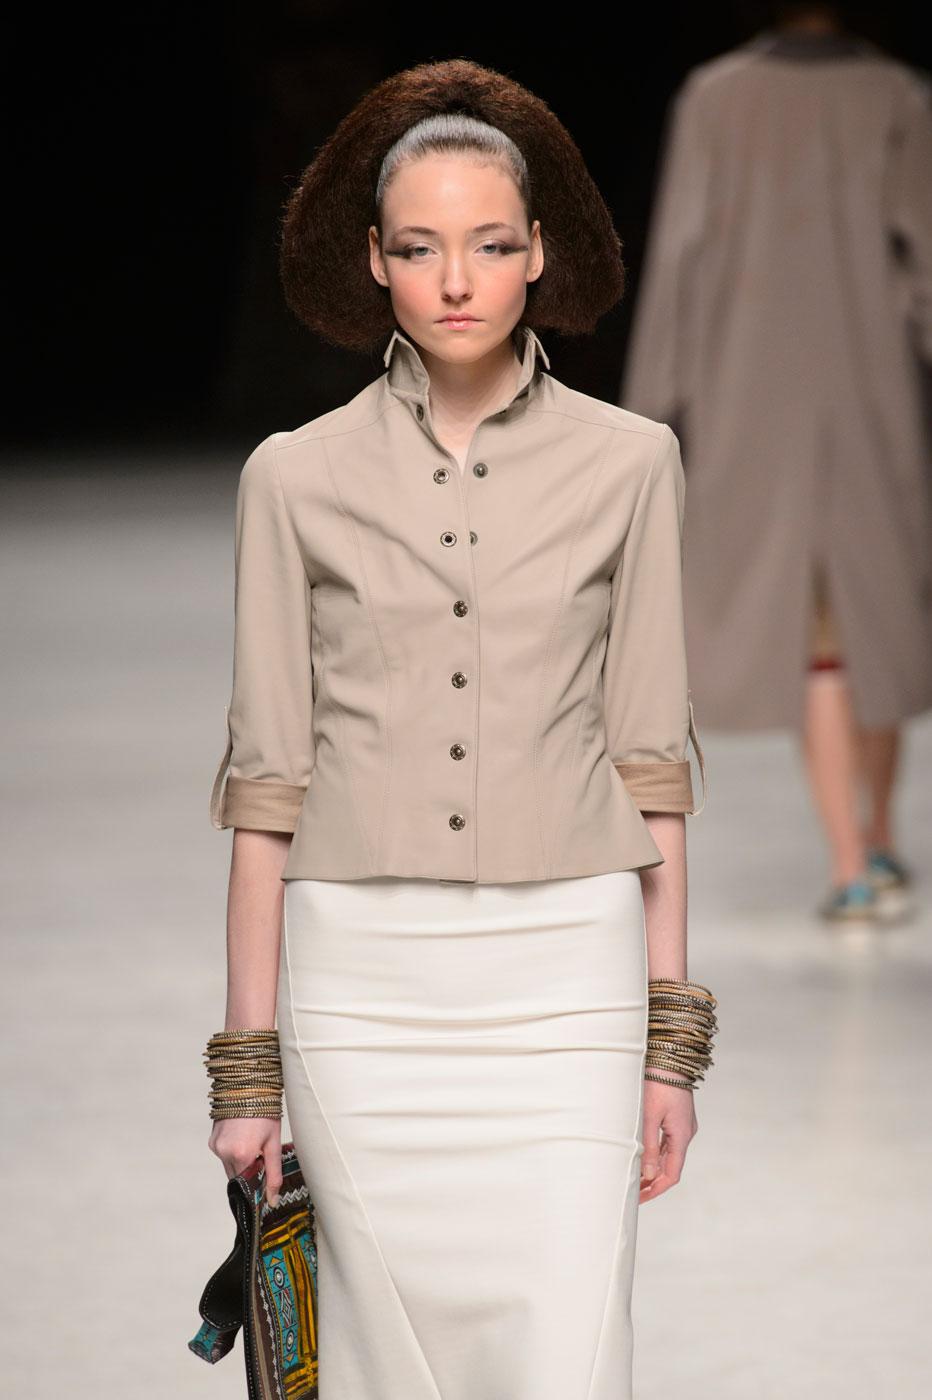 Julien-Fournie-Prive-fashion-runway-show-haute-couture-paris-spring-2015-the-impression-15